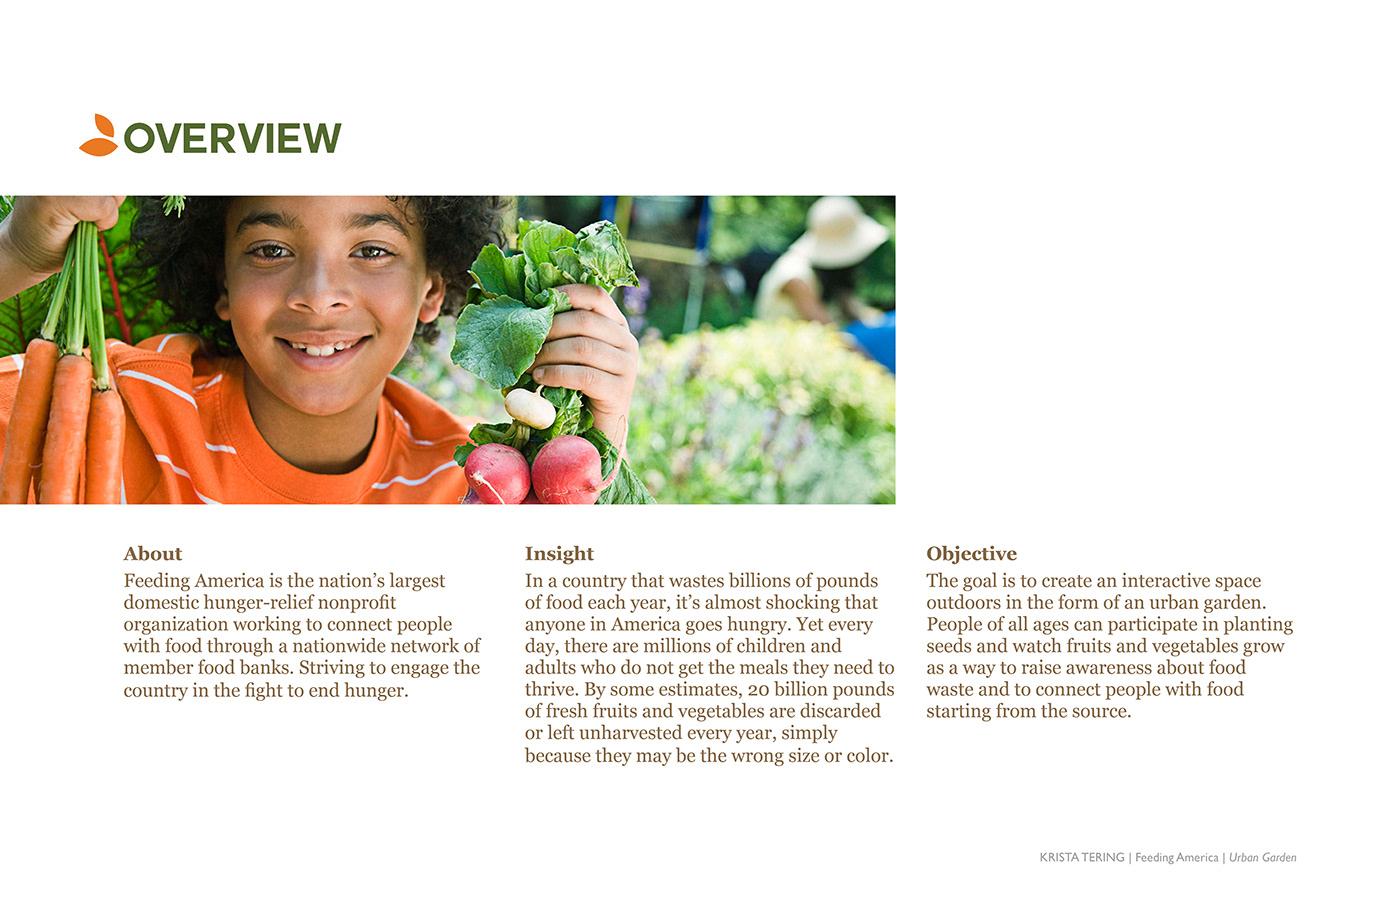 concept Exhibition Design  rendering urban garden visual presentation